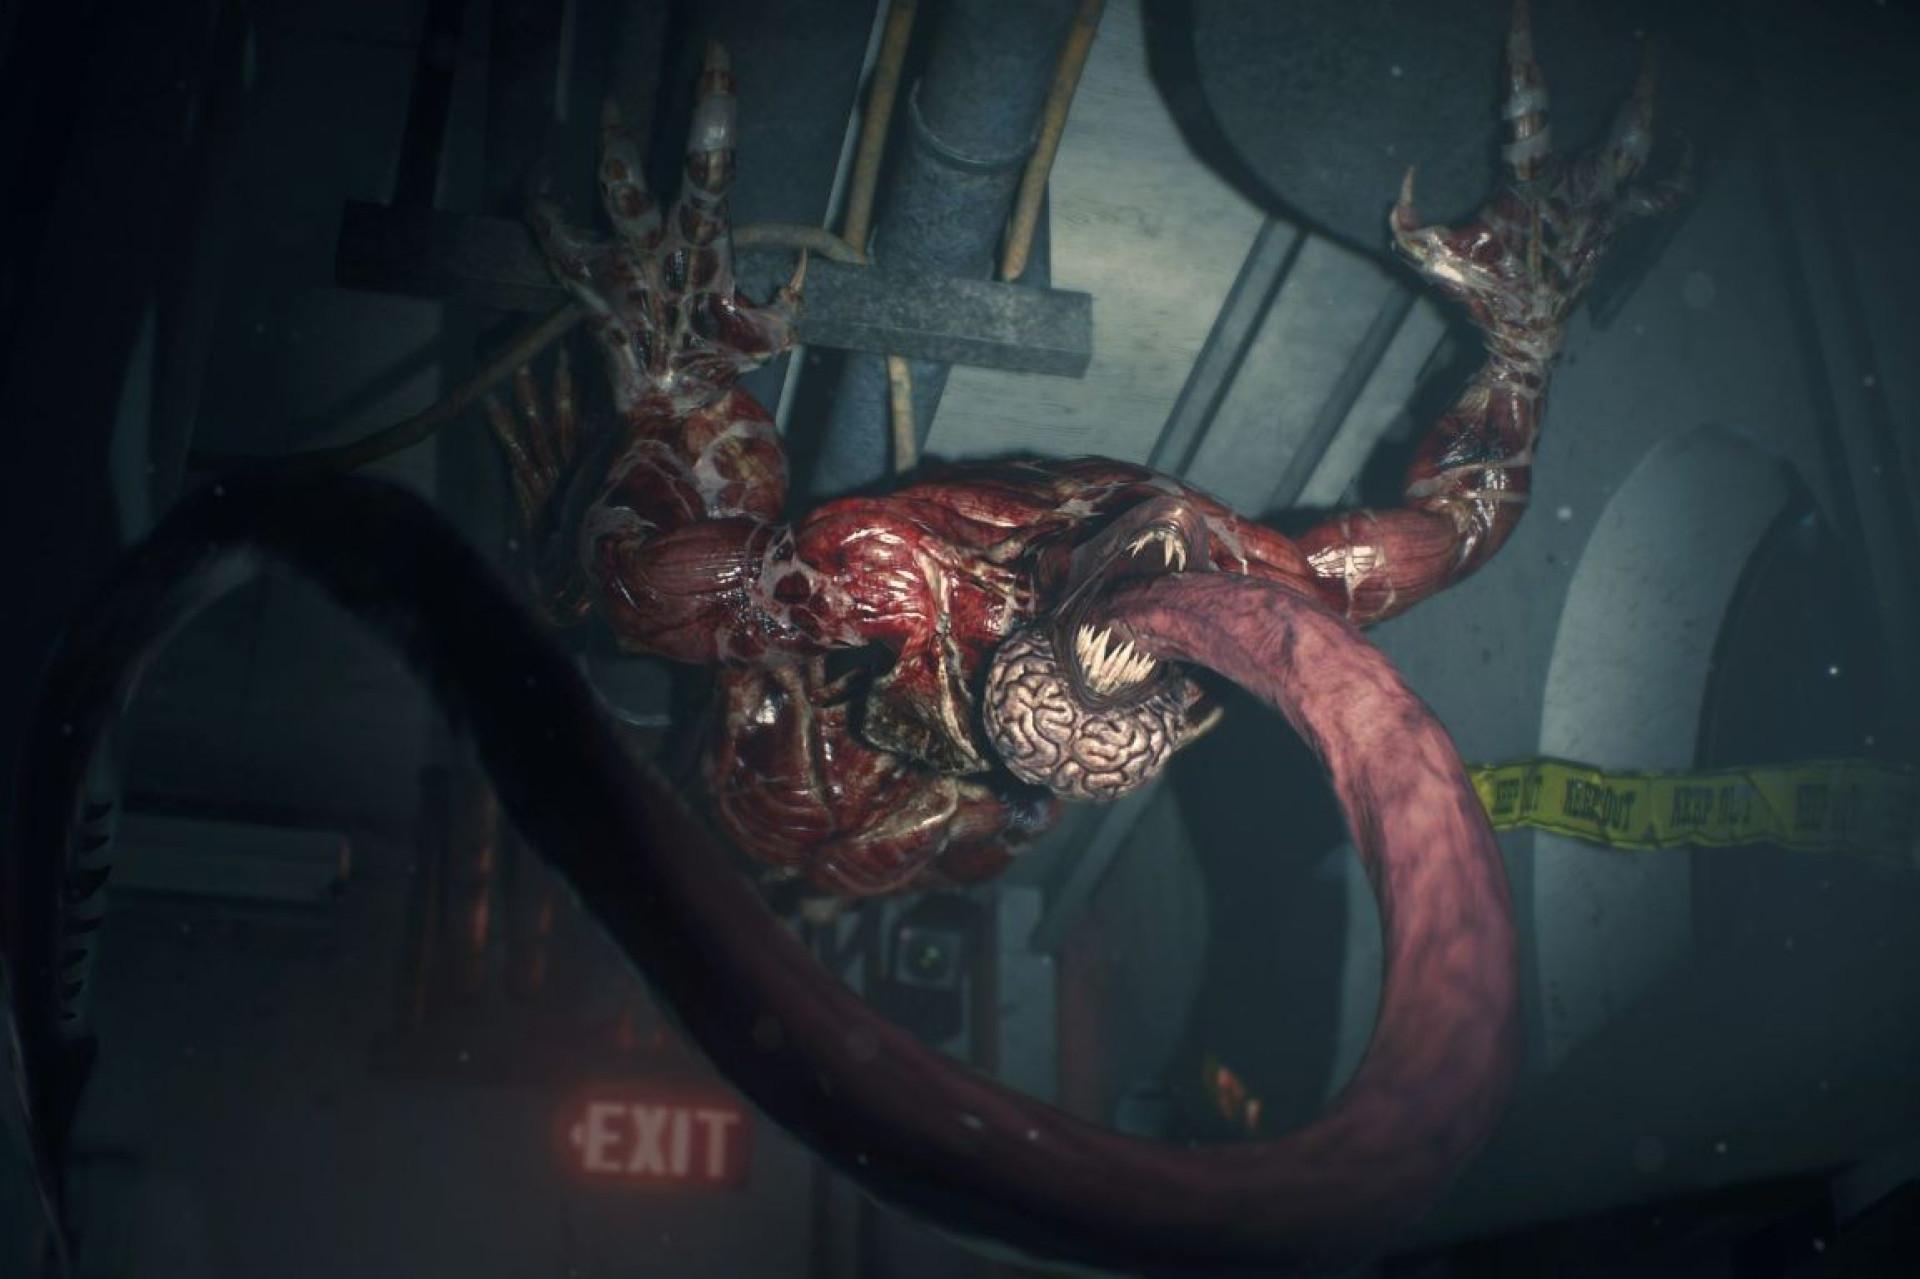 Vídeo mostra volta dos lickers no próximo 'Resident Evil'